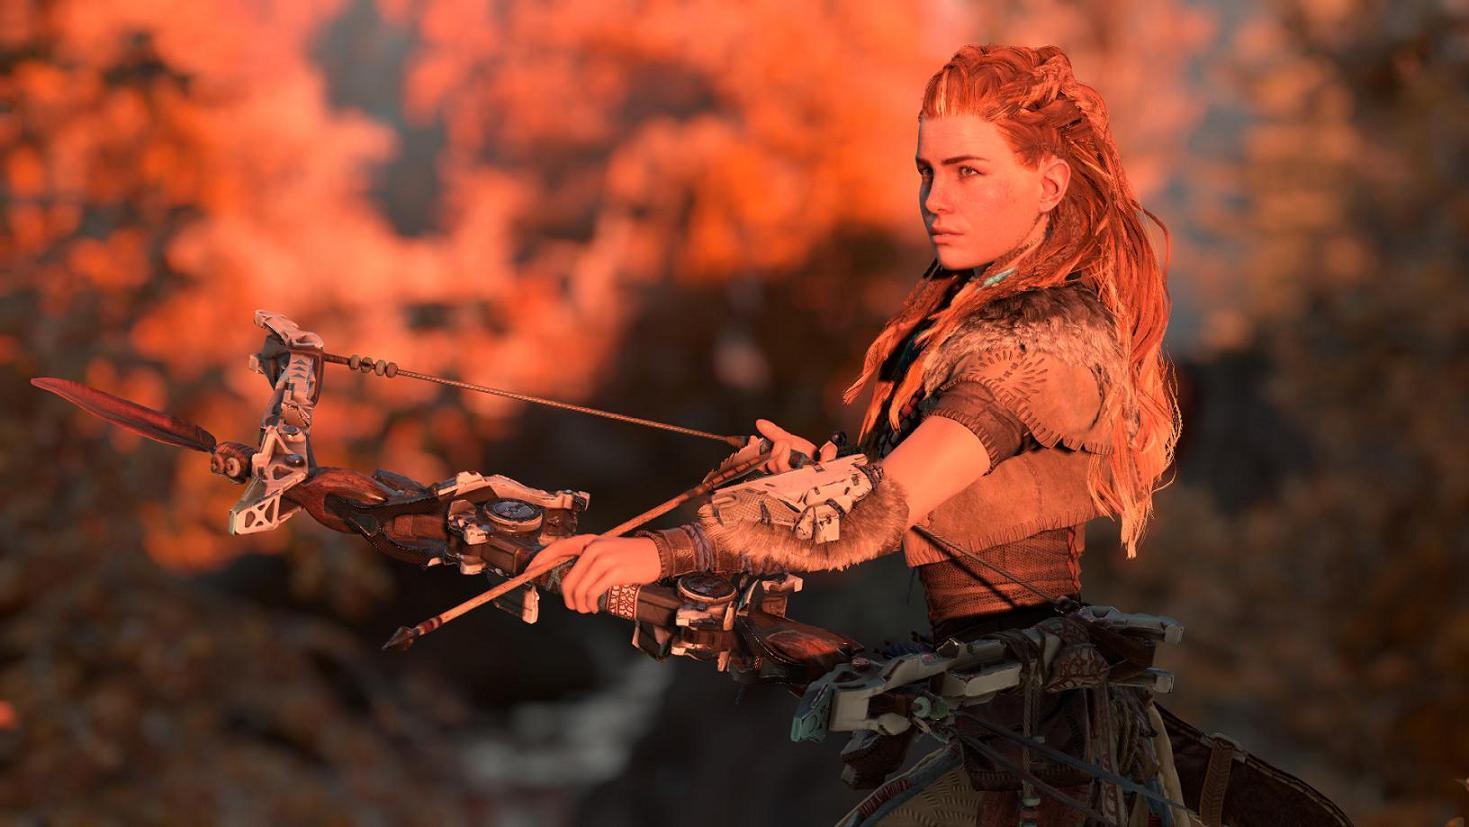 'Horizon Zero Dawn': Aloy May Be the Next PlayStation Icon